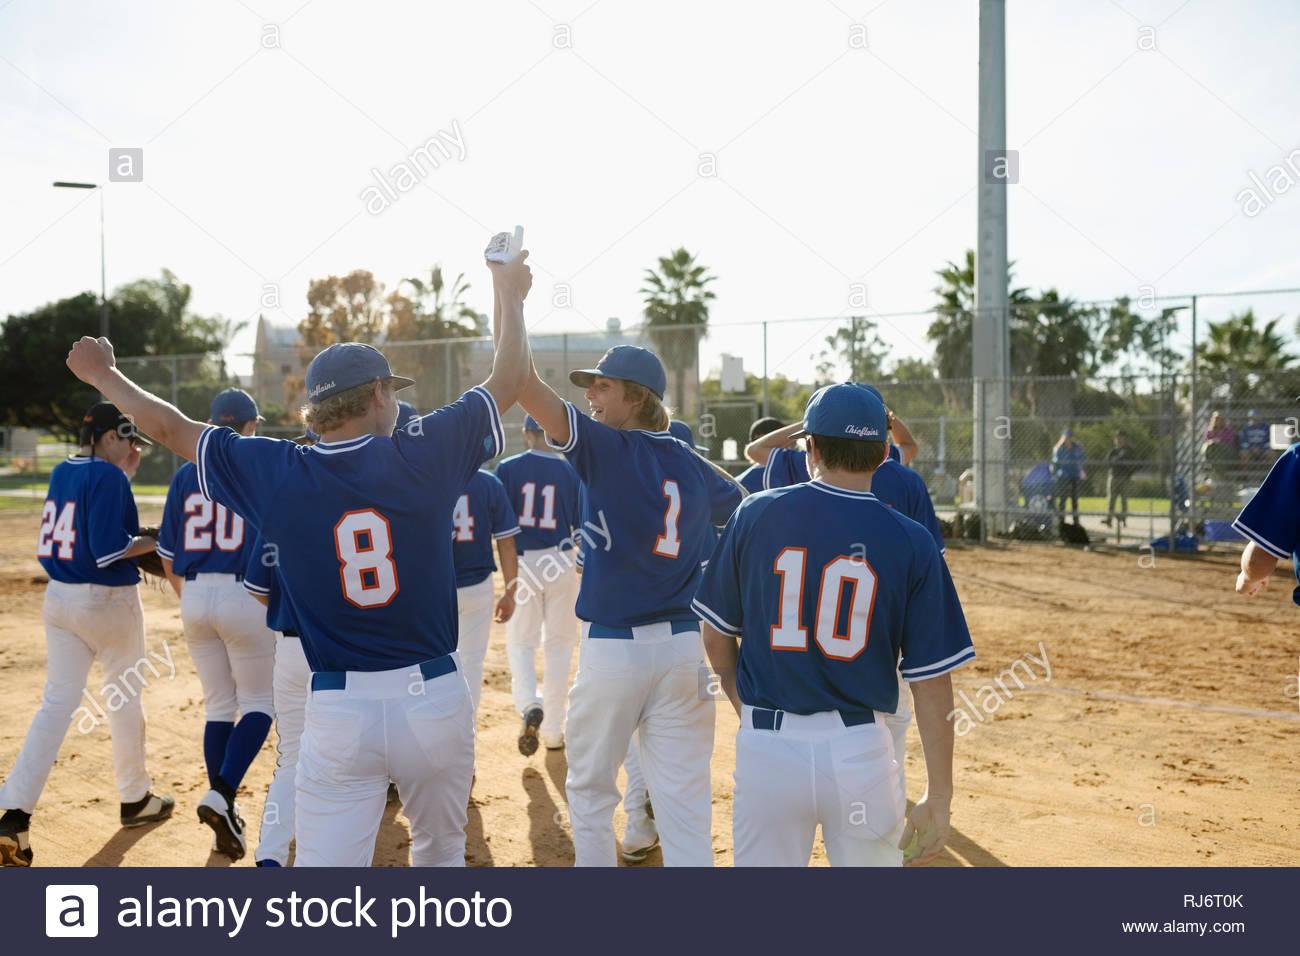 Baseball players cheering, walking off sunny field - Stock Image